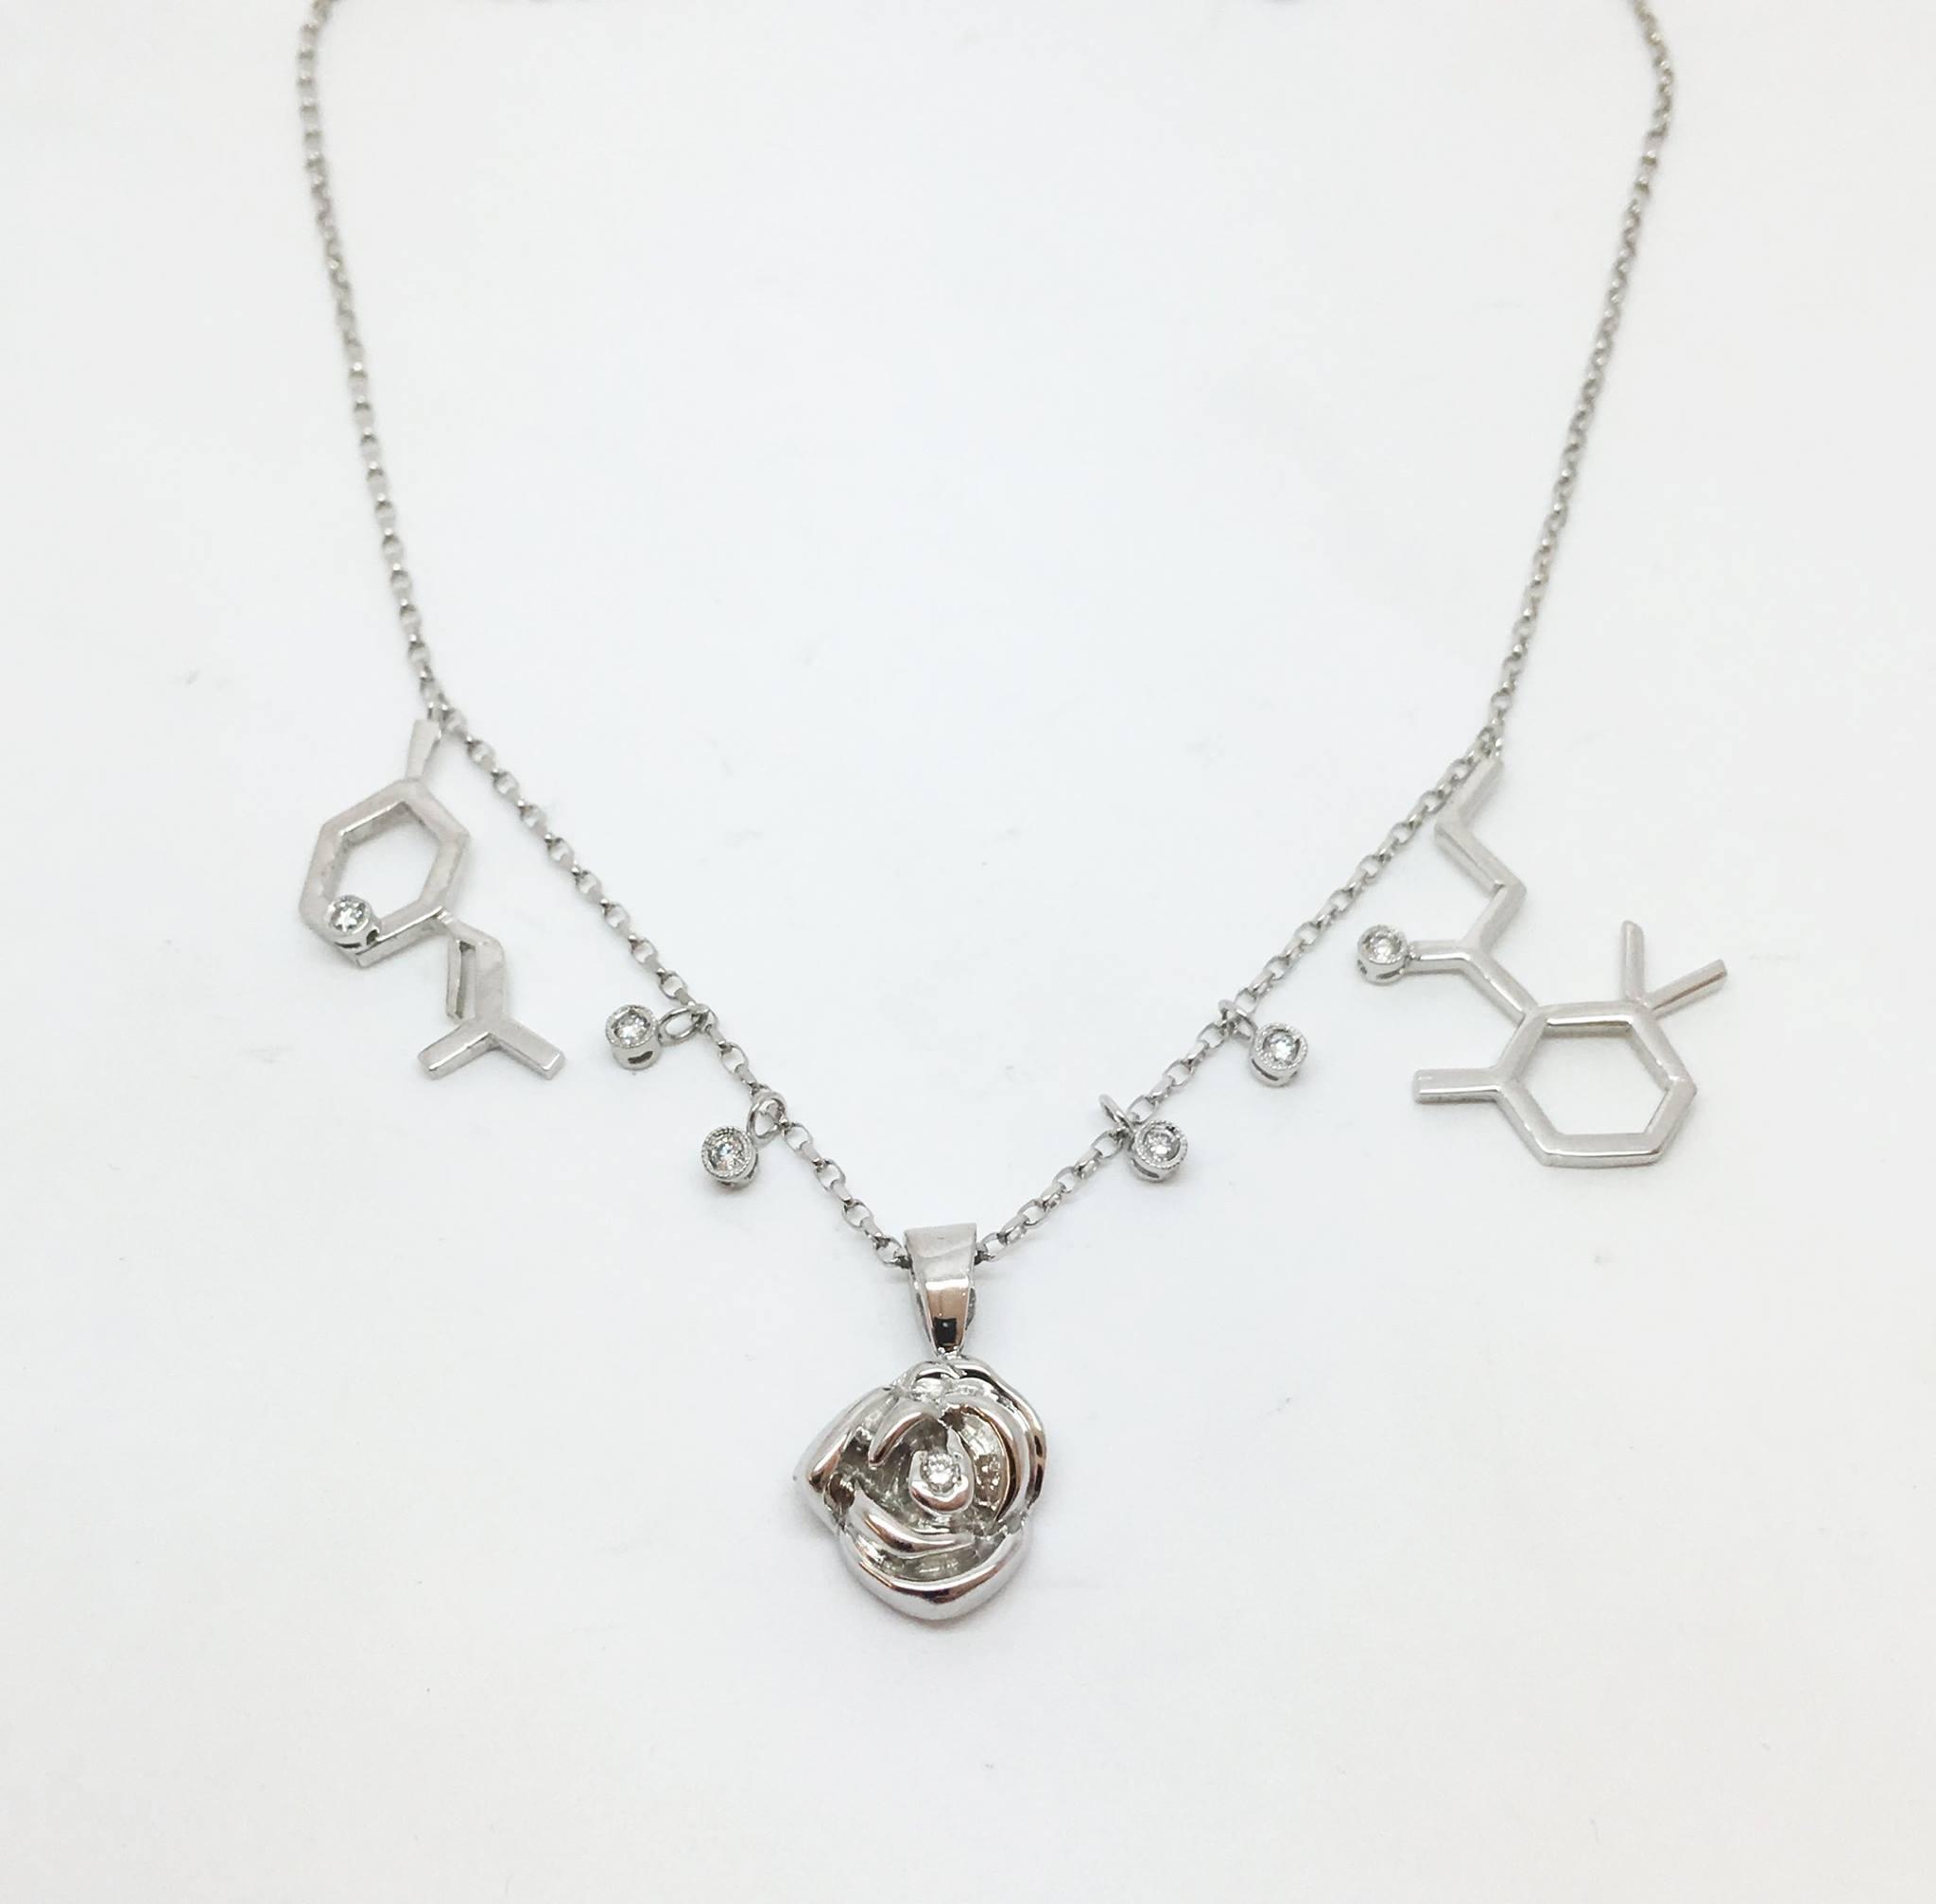 Jewellery by Lora Leedham